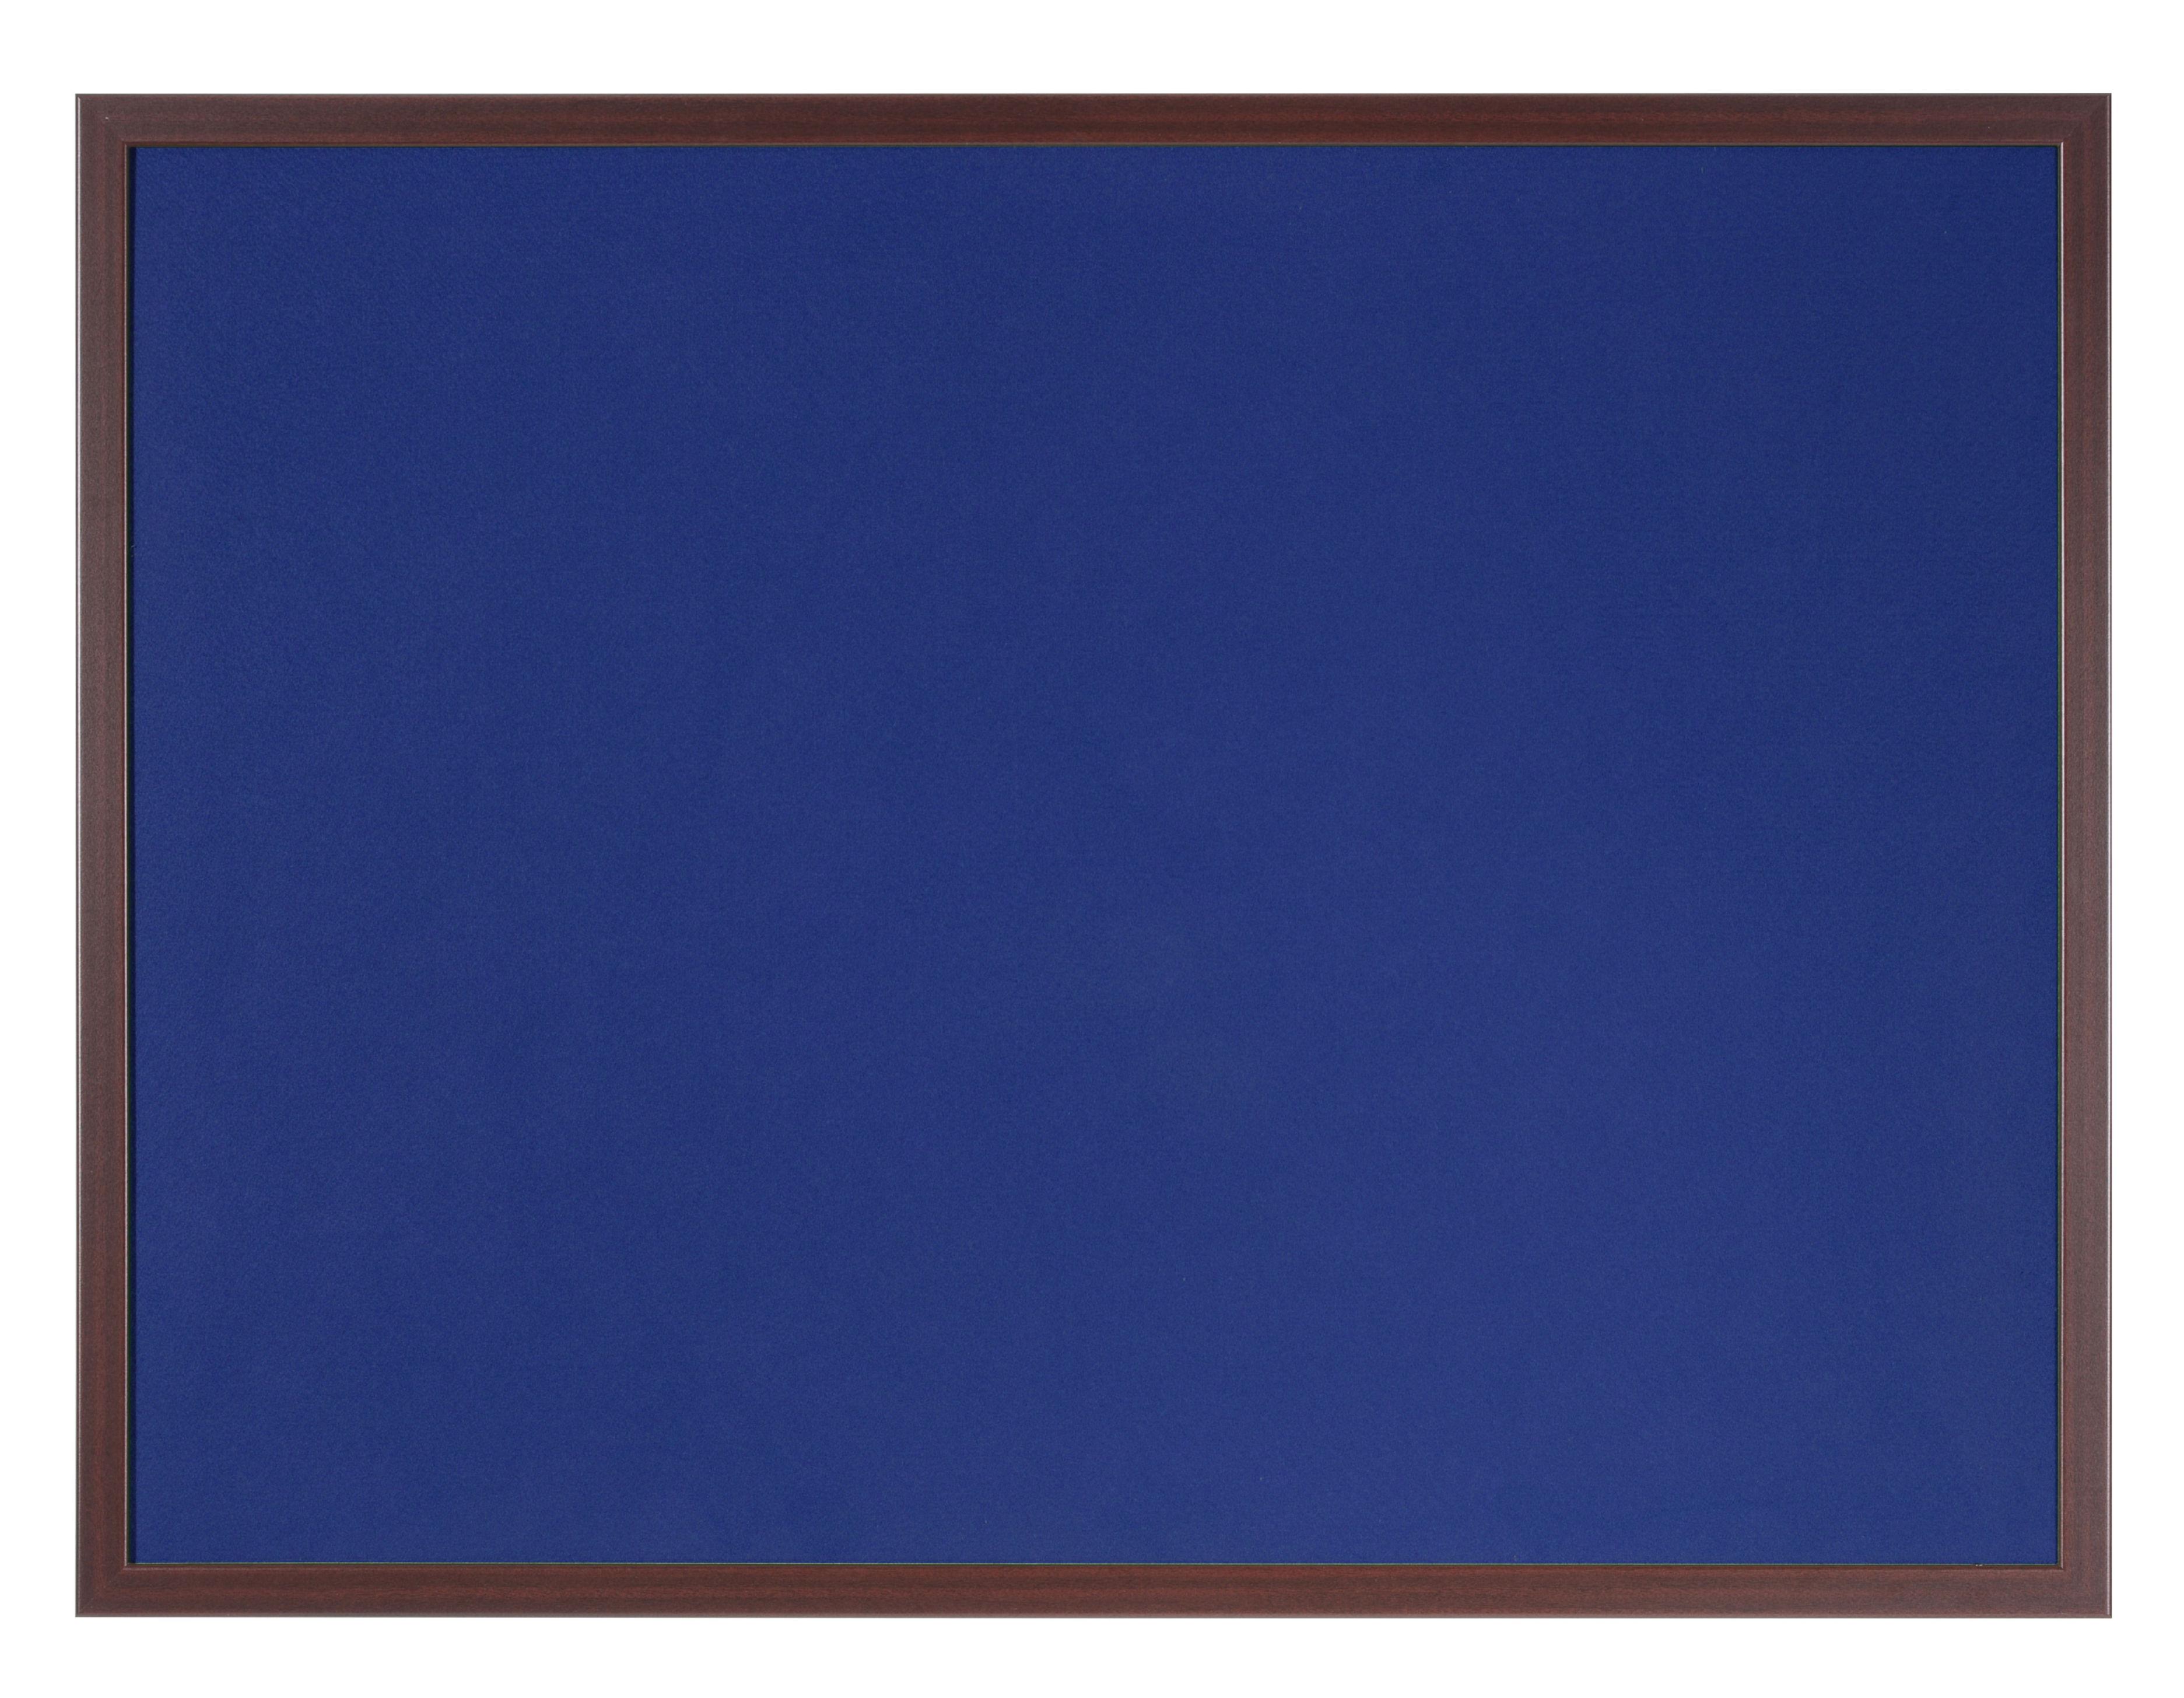 Felt Bi-Office Earth-It Blue Felt 60x90cm cherry wd 32 mm frm